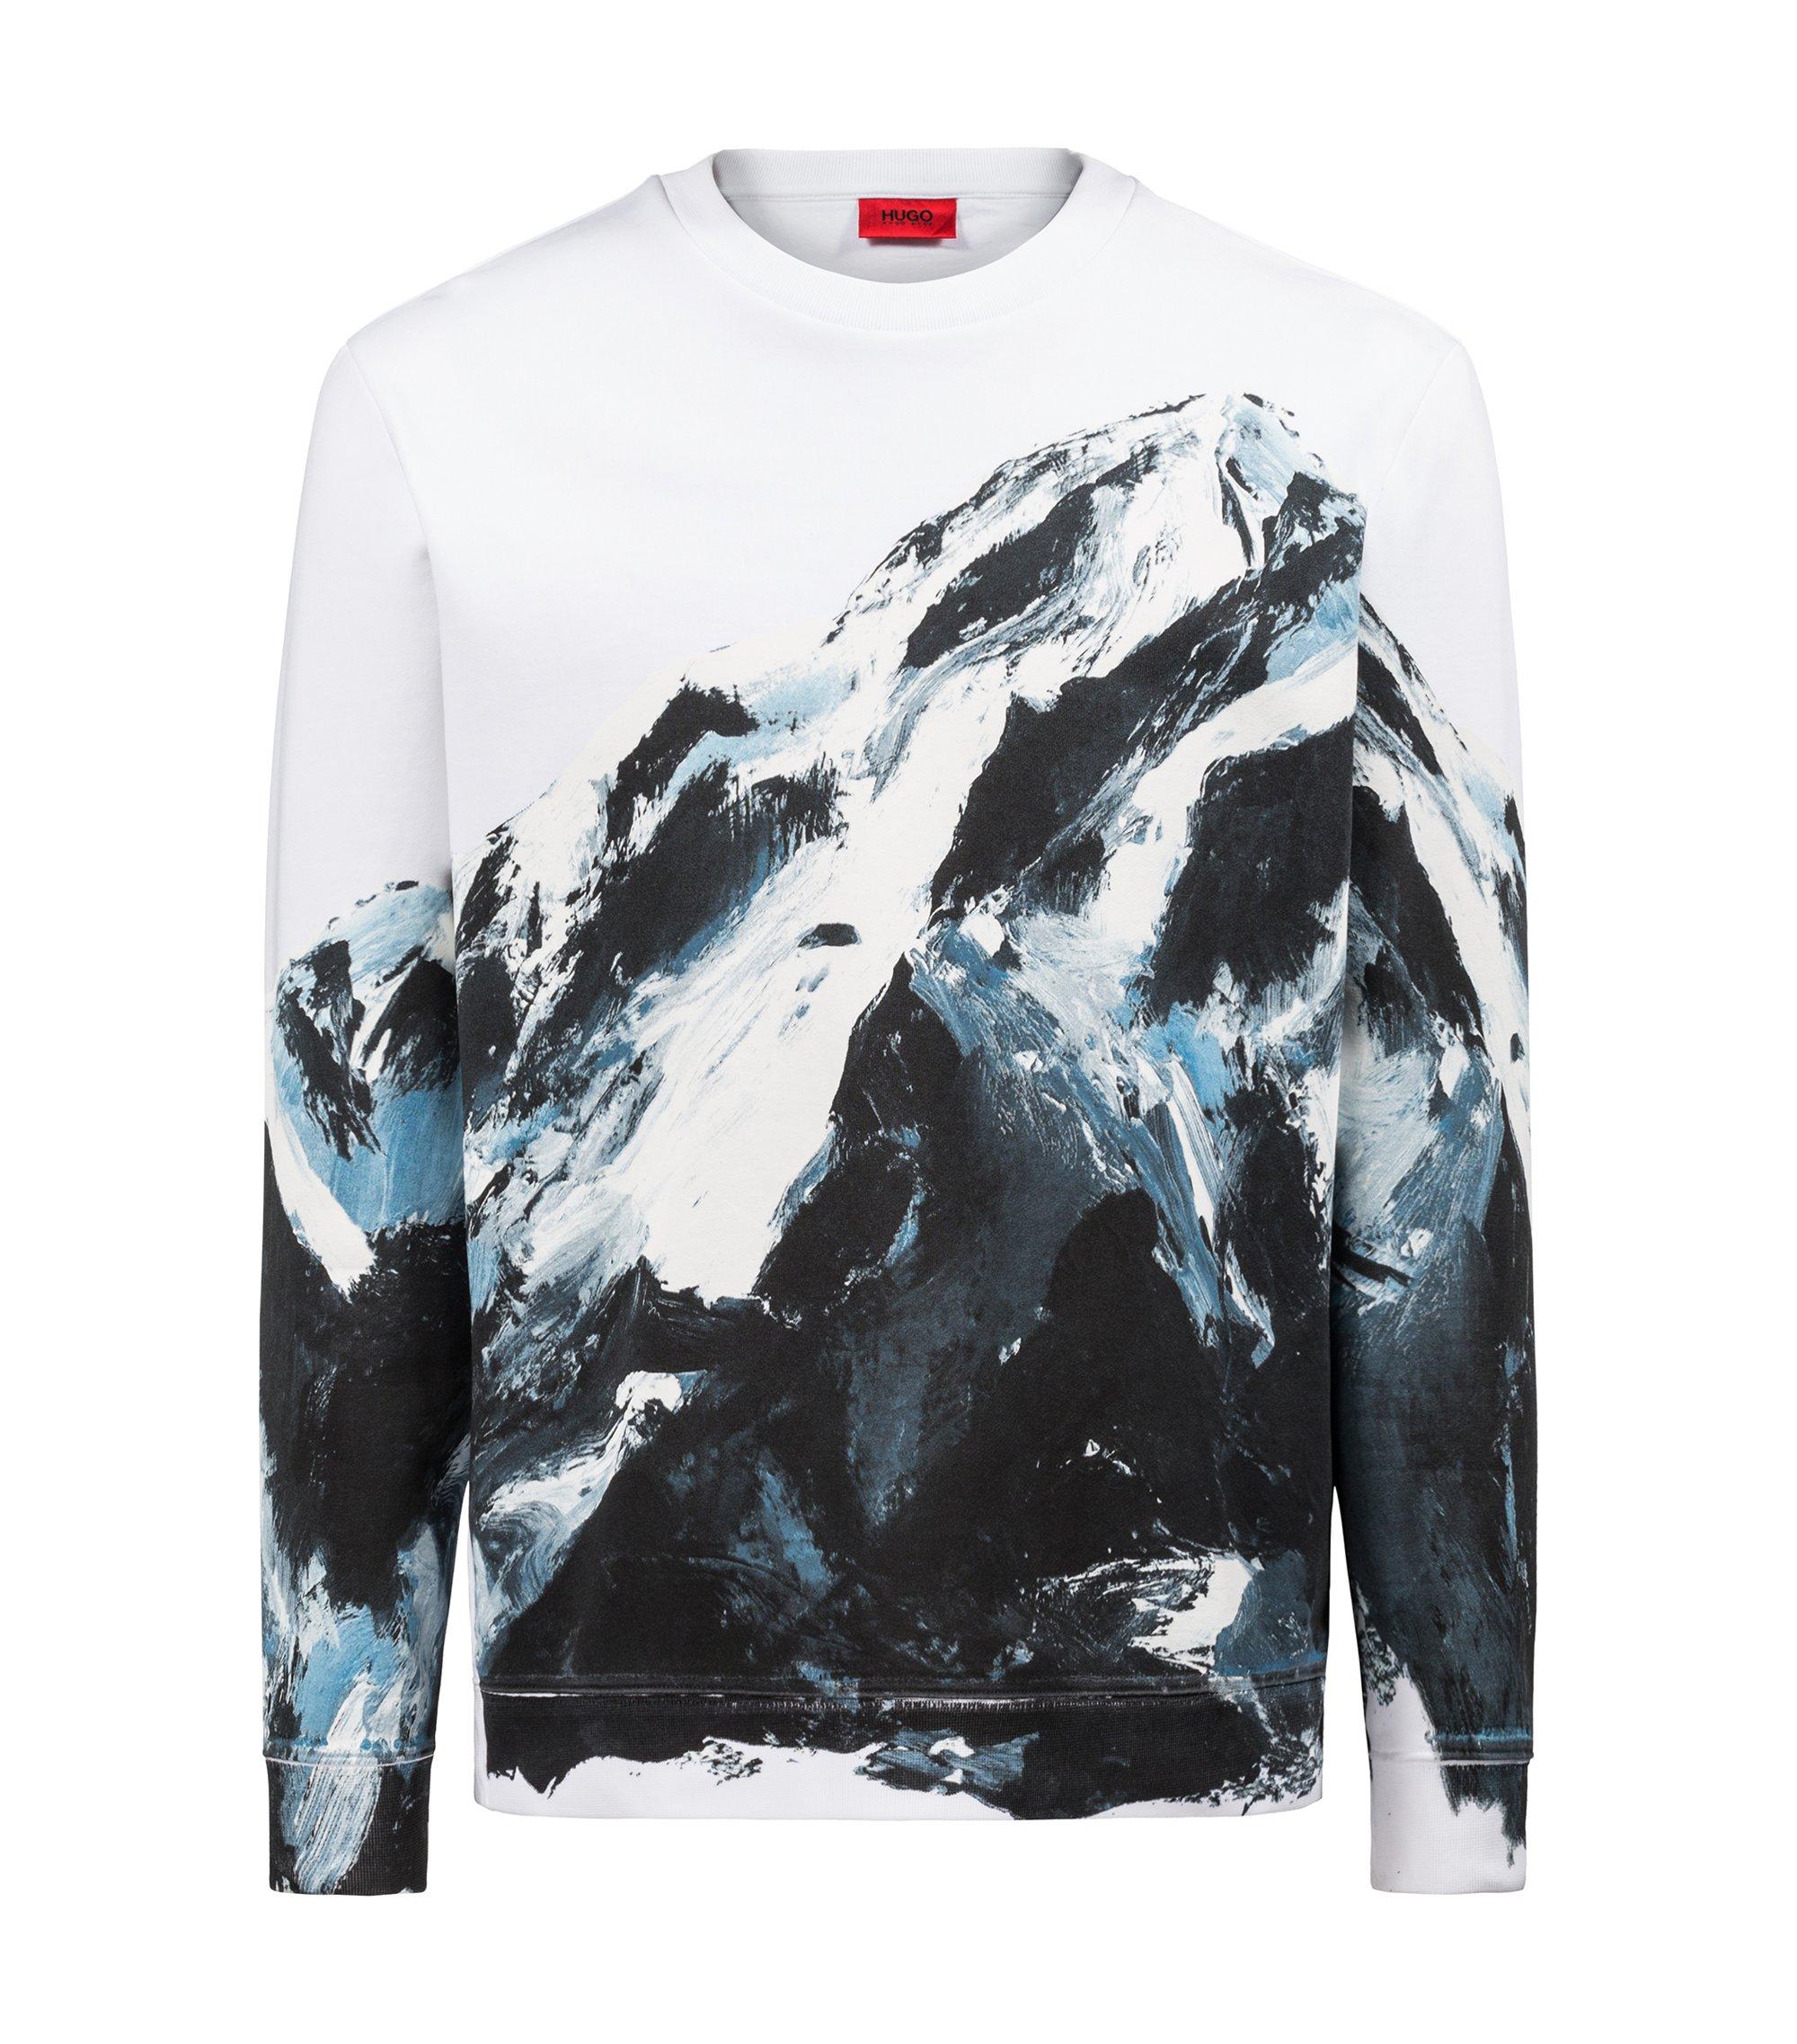 Oversized Sweatshirt aus Baumwolle mit Berg-Motiv, Gemustert